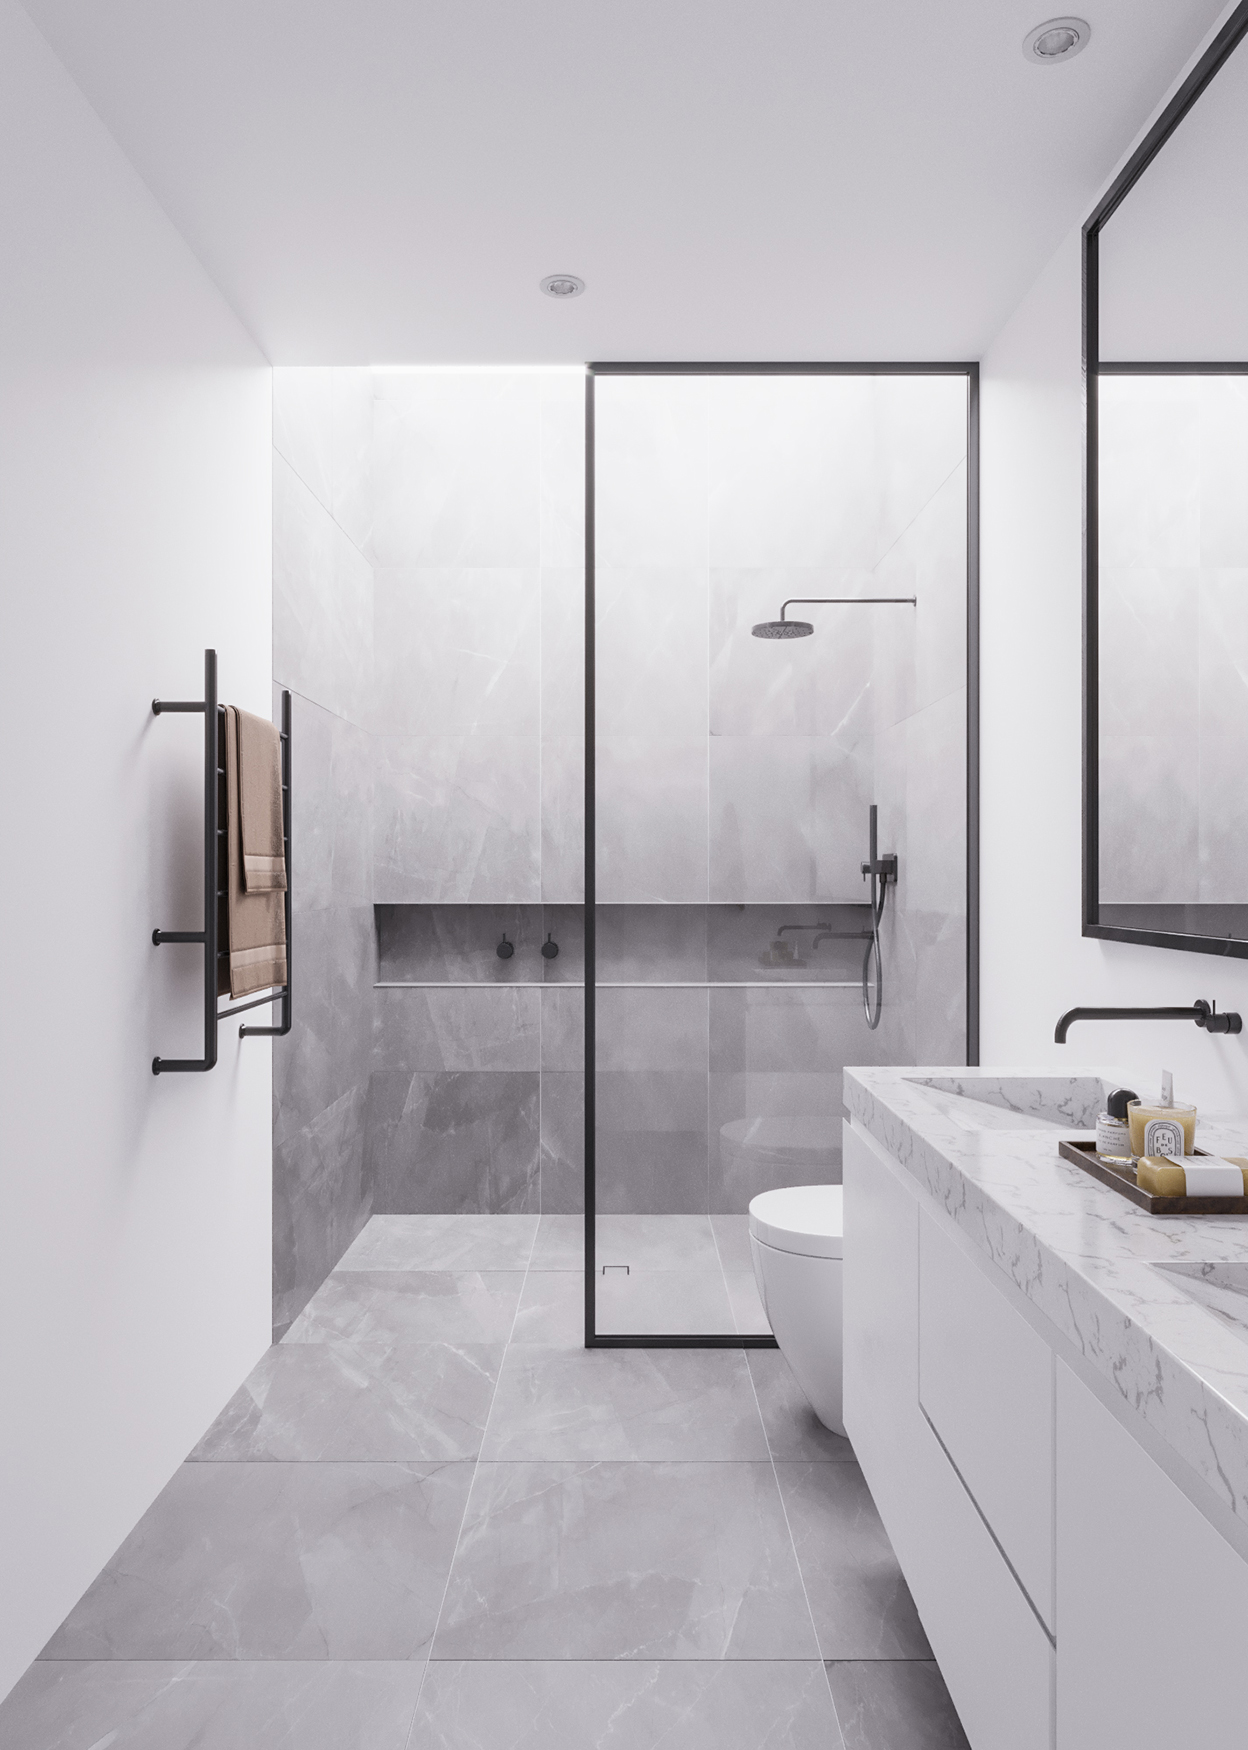 MK2 Bathroom by Giovanne Souza - Showcase - Talk at Ronen Bekerman\'s ...